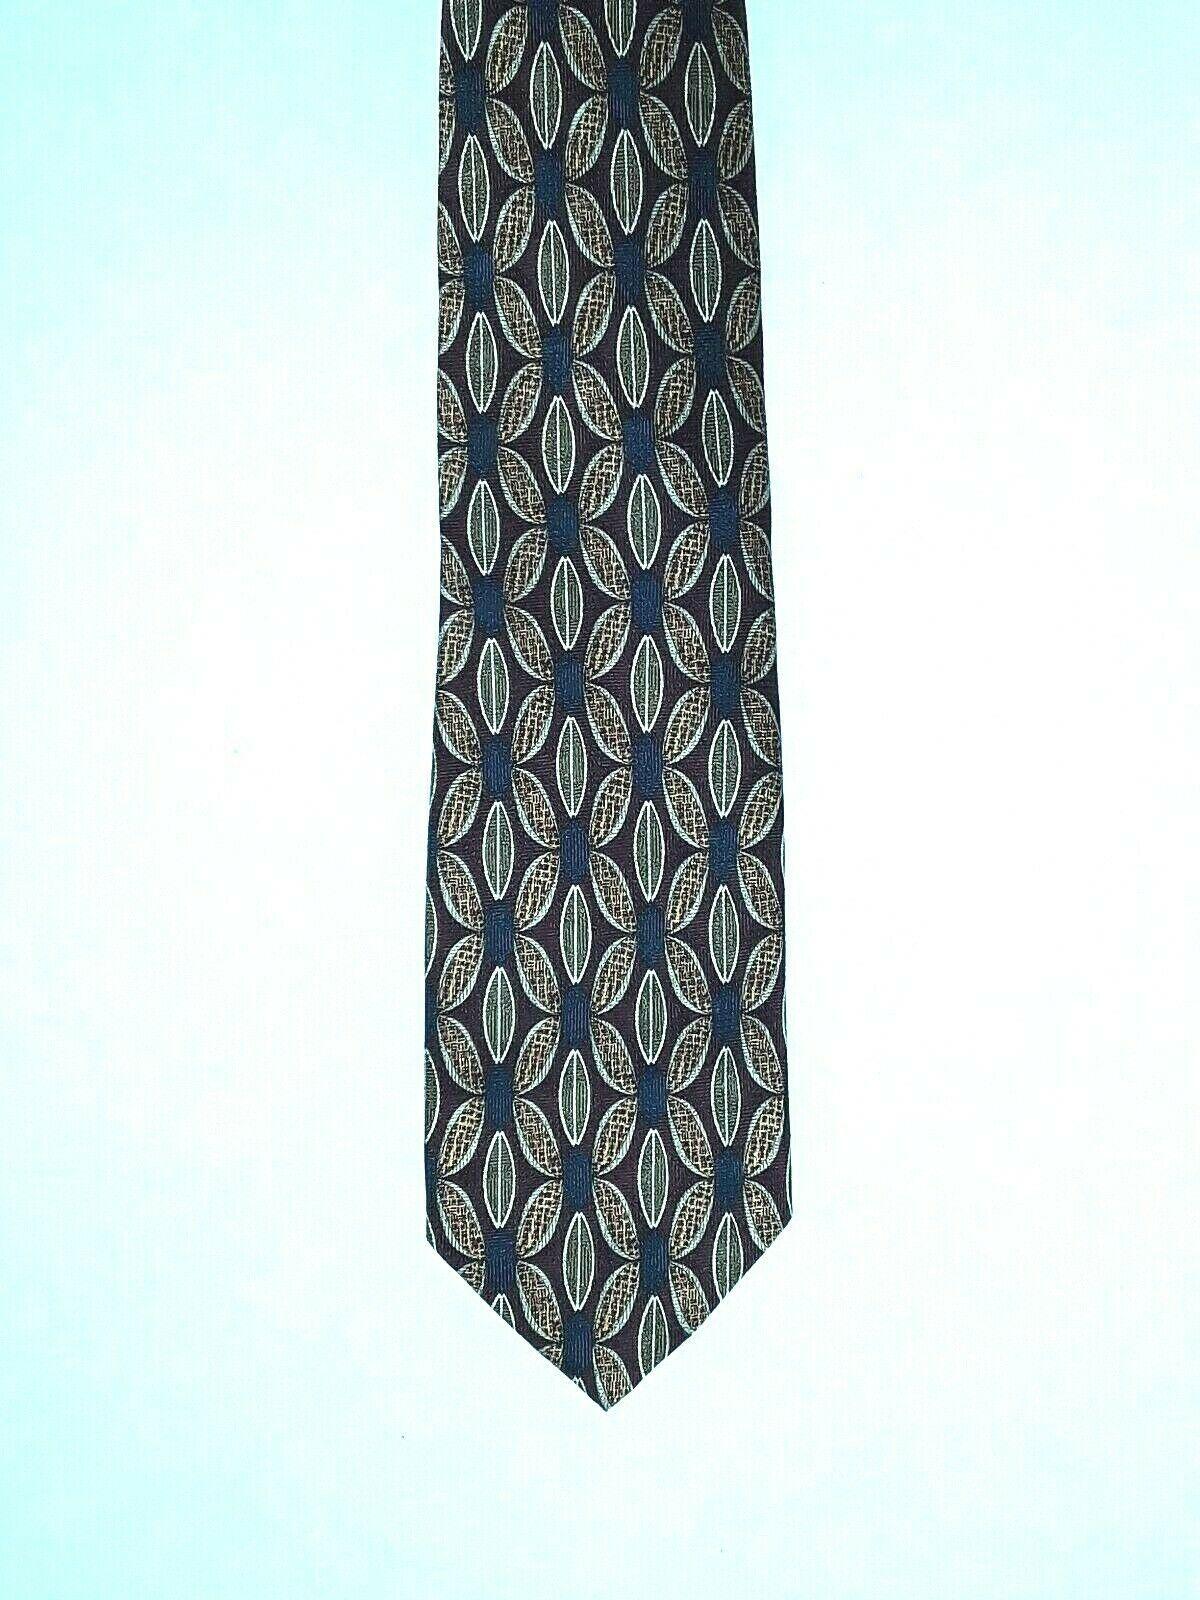 "Louis Roth Men's Tie Necktie 100% Silk Gold Black Burgundy Geometric 59"" x 4"" image 7"